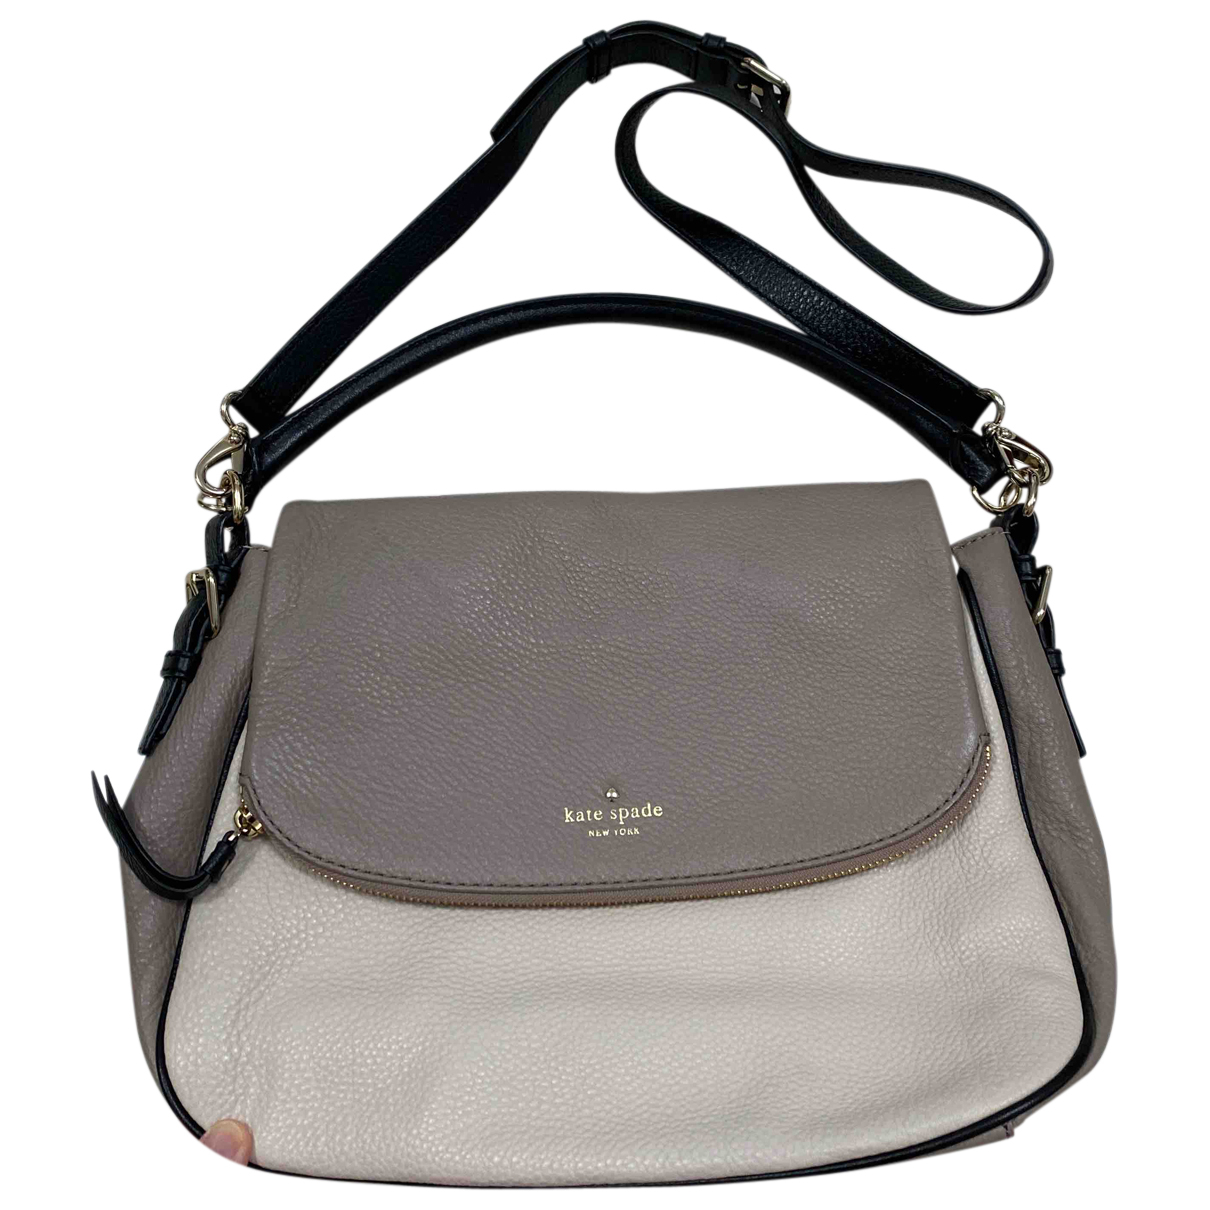 Kate Spade N Multicolour Leather handbag for Women N